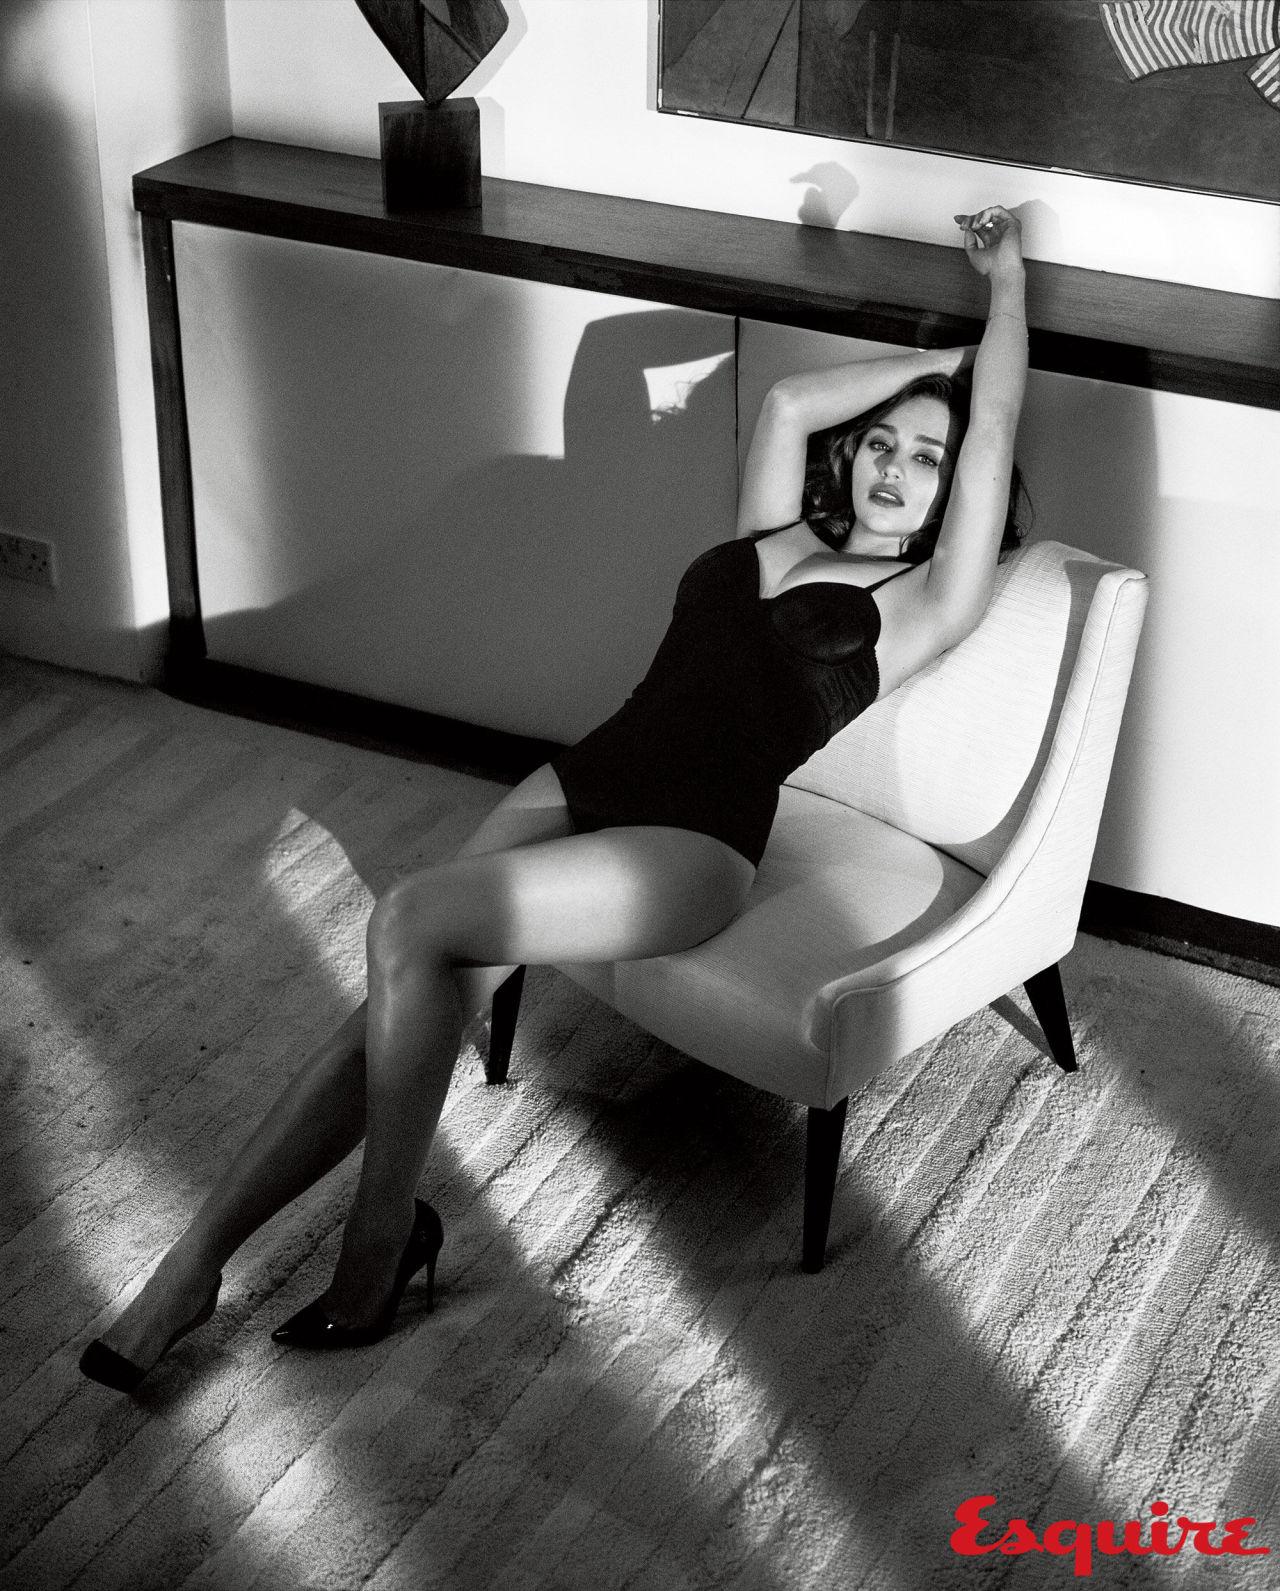 gallery-1444418793-emilia-clarke-sexiest-woman-alive-2015-001